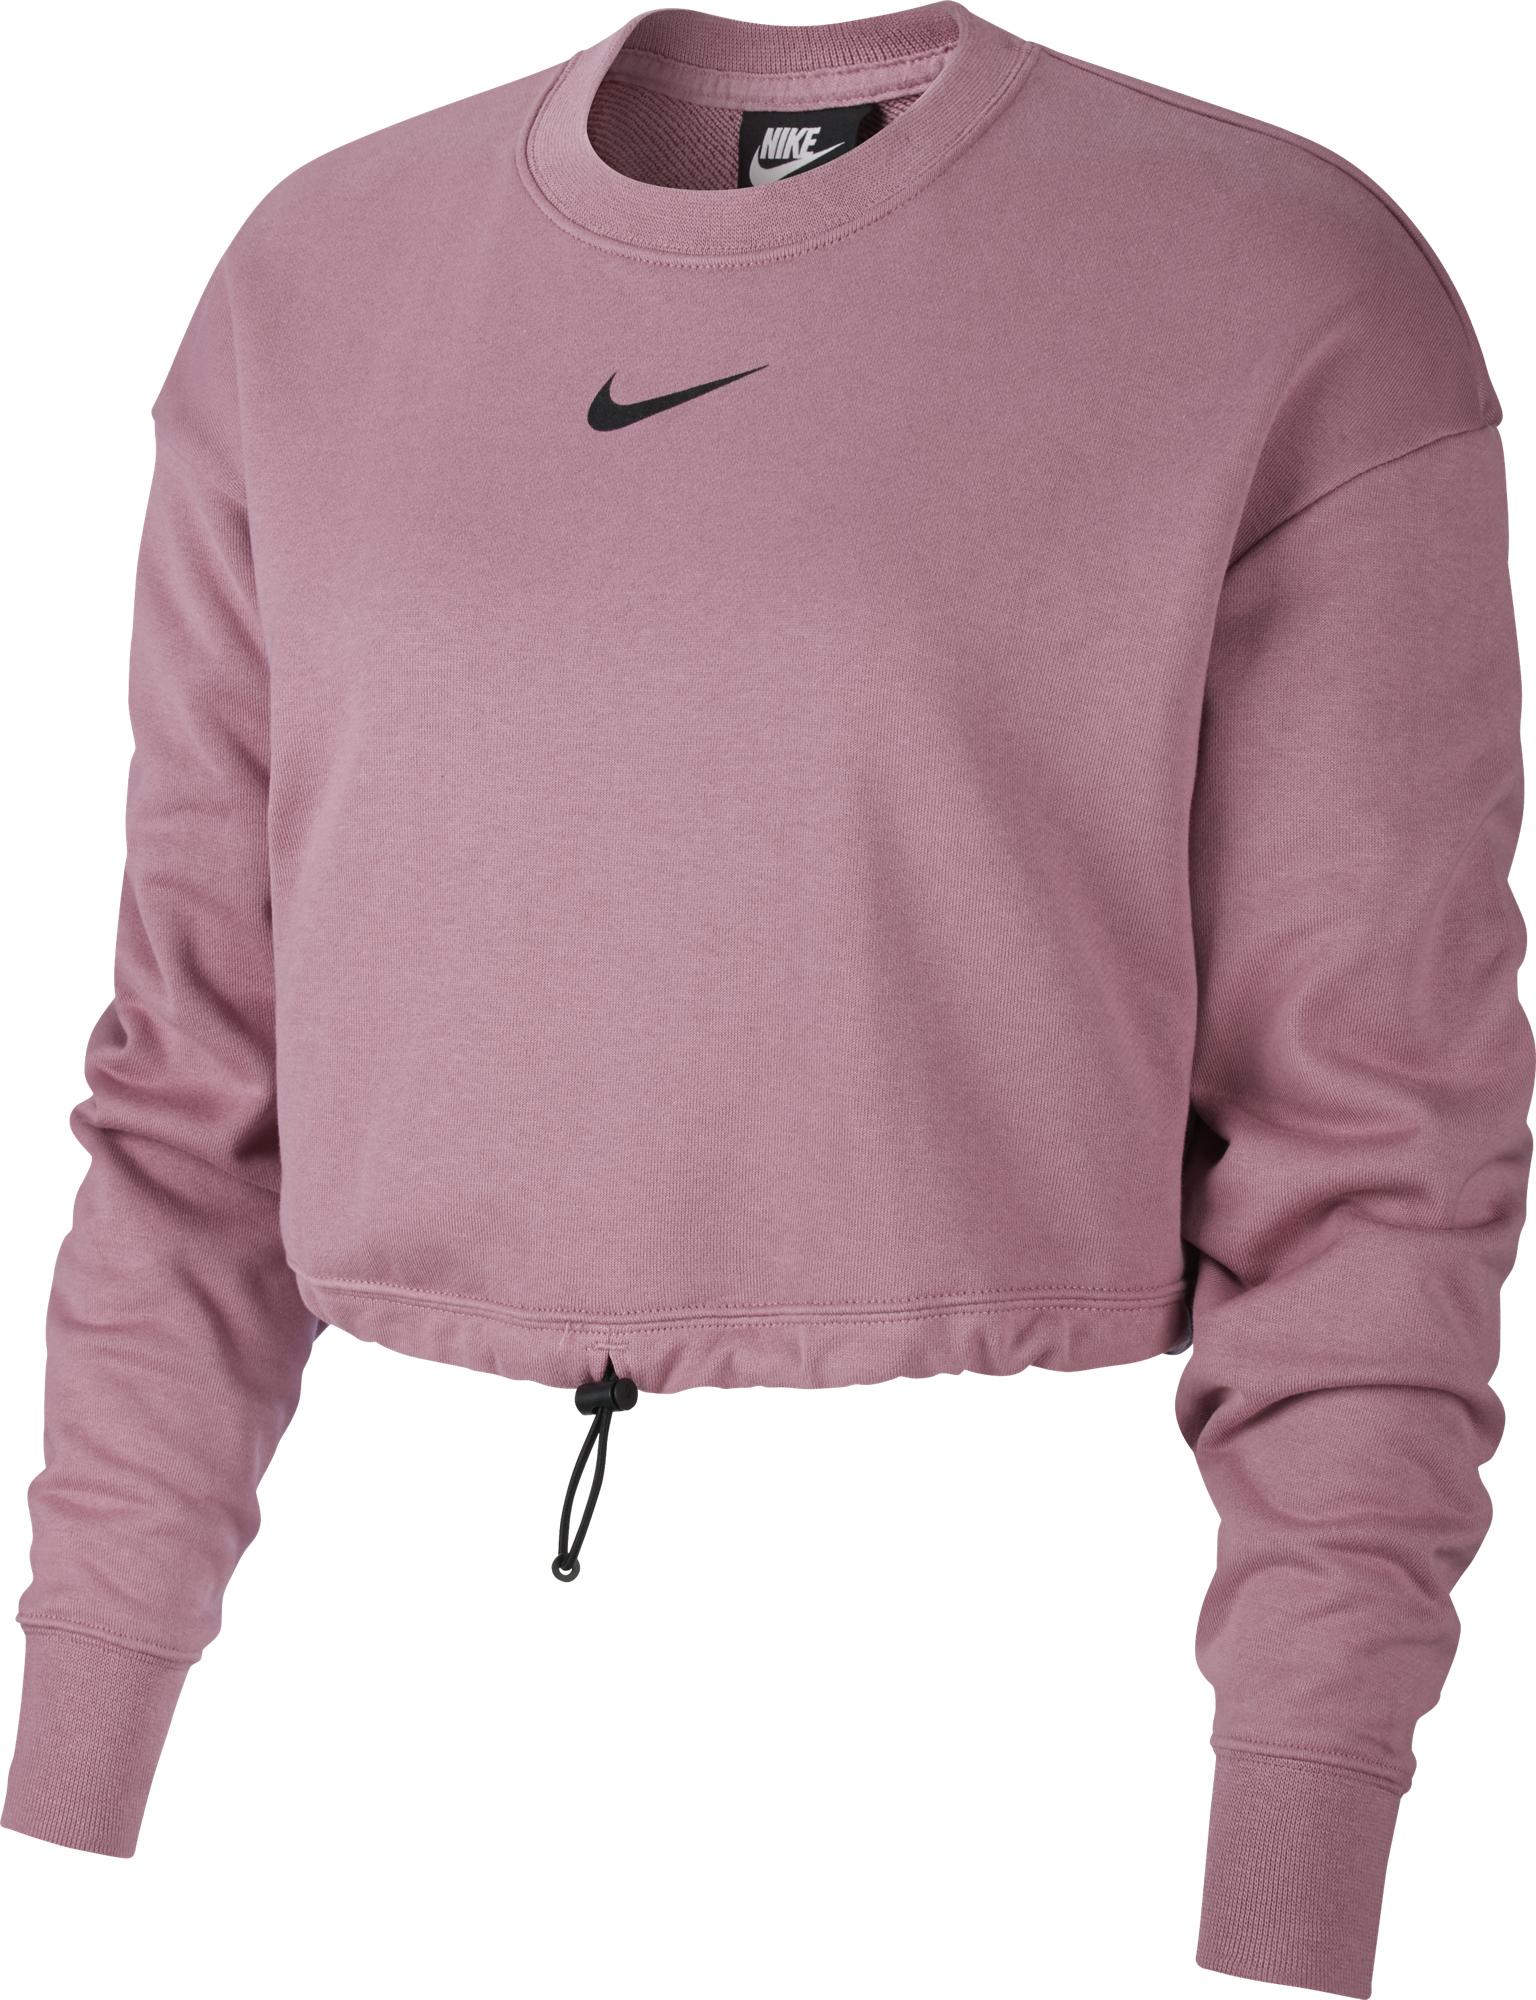 Nike Свитшот женский Sportswear Swoosh, размер 42-44